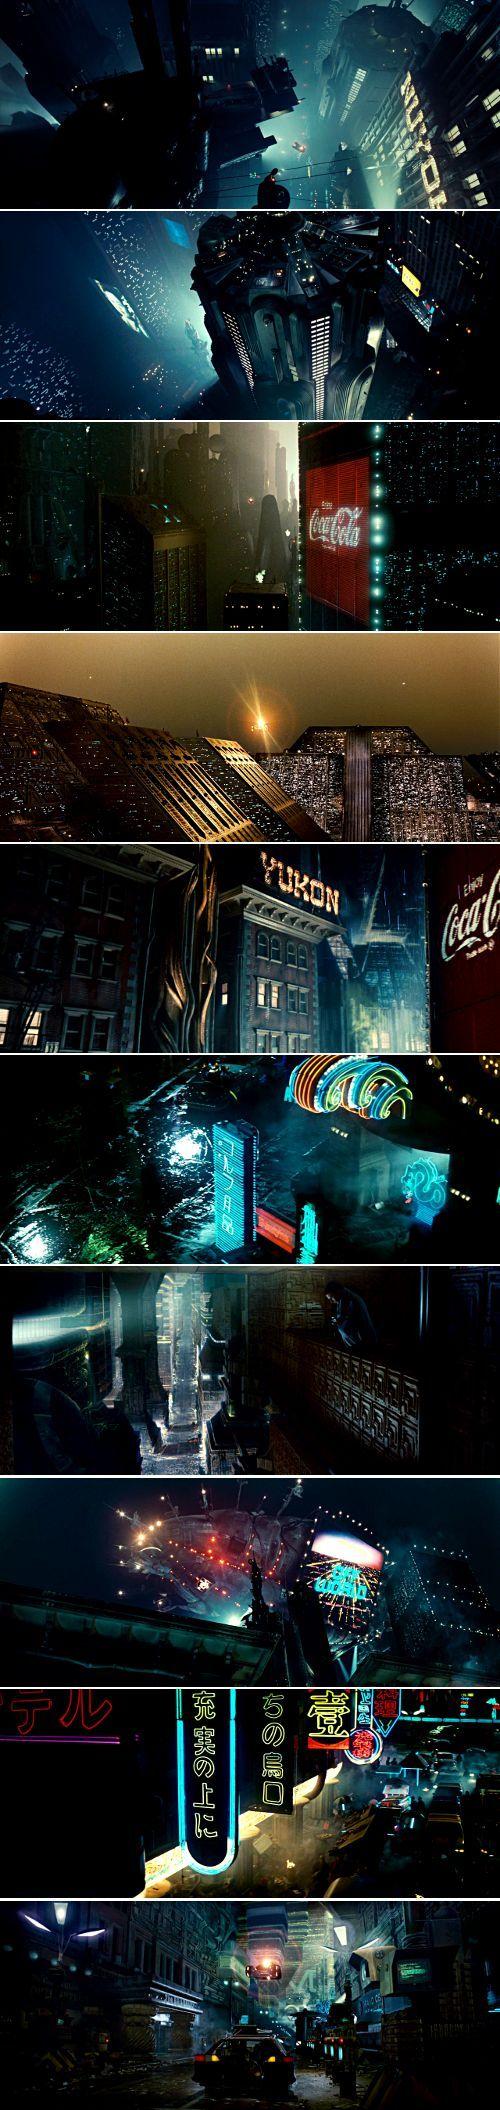 Los Angeles, 2019 Blade Runner (1982) dir. Ridley Scott